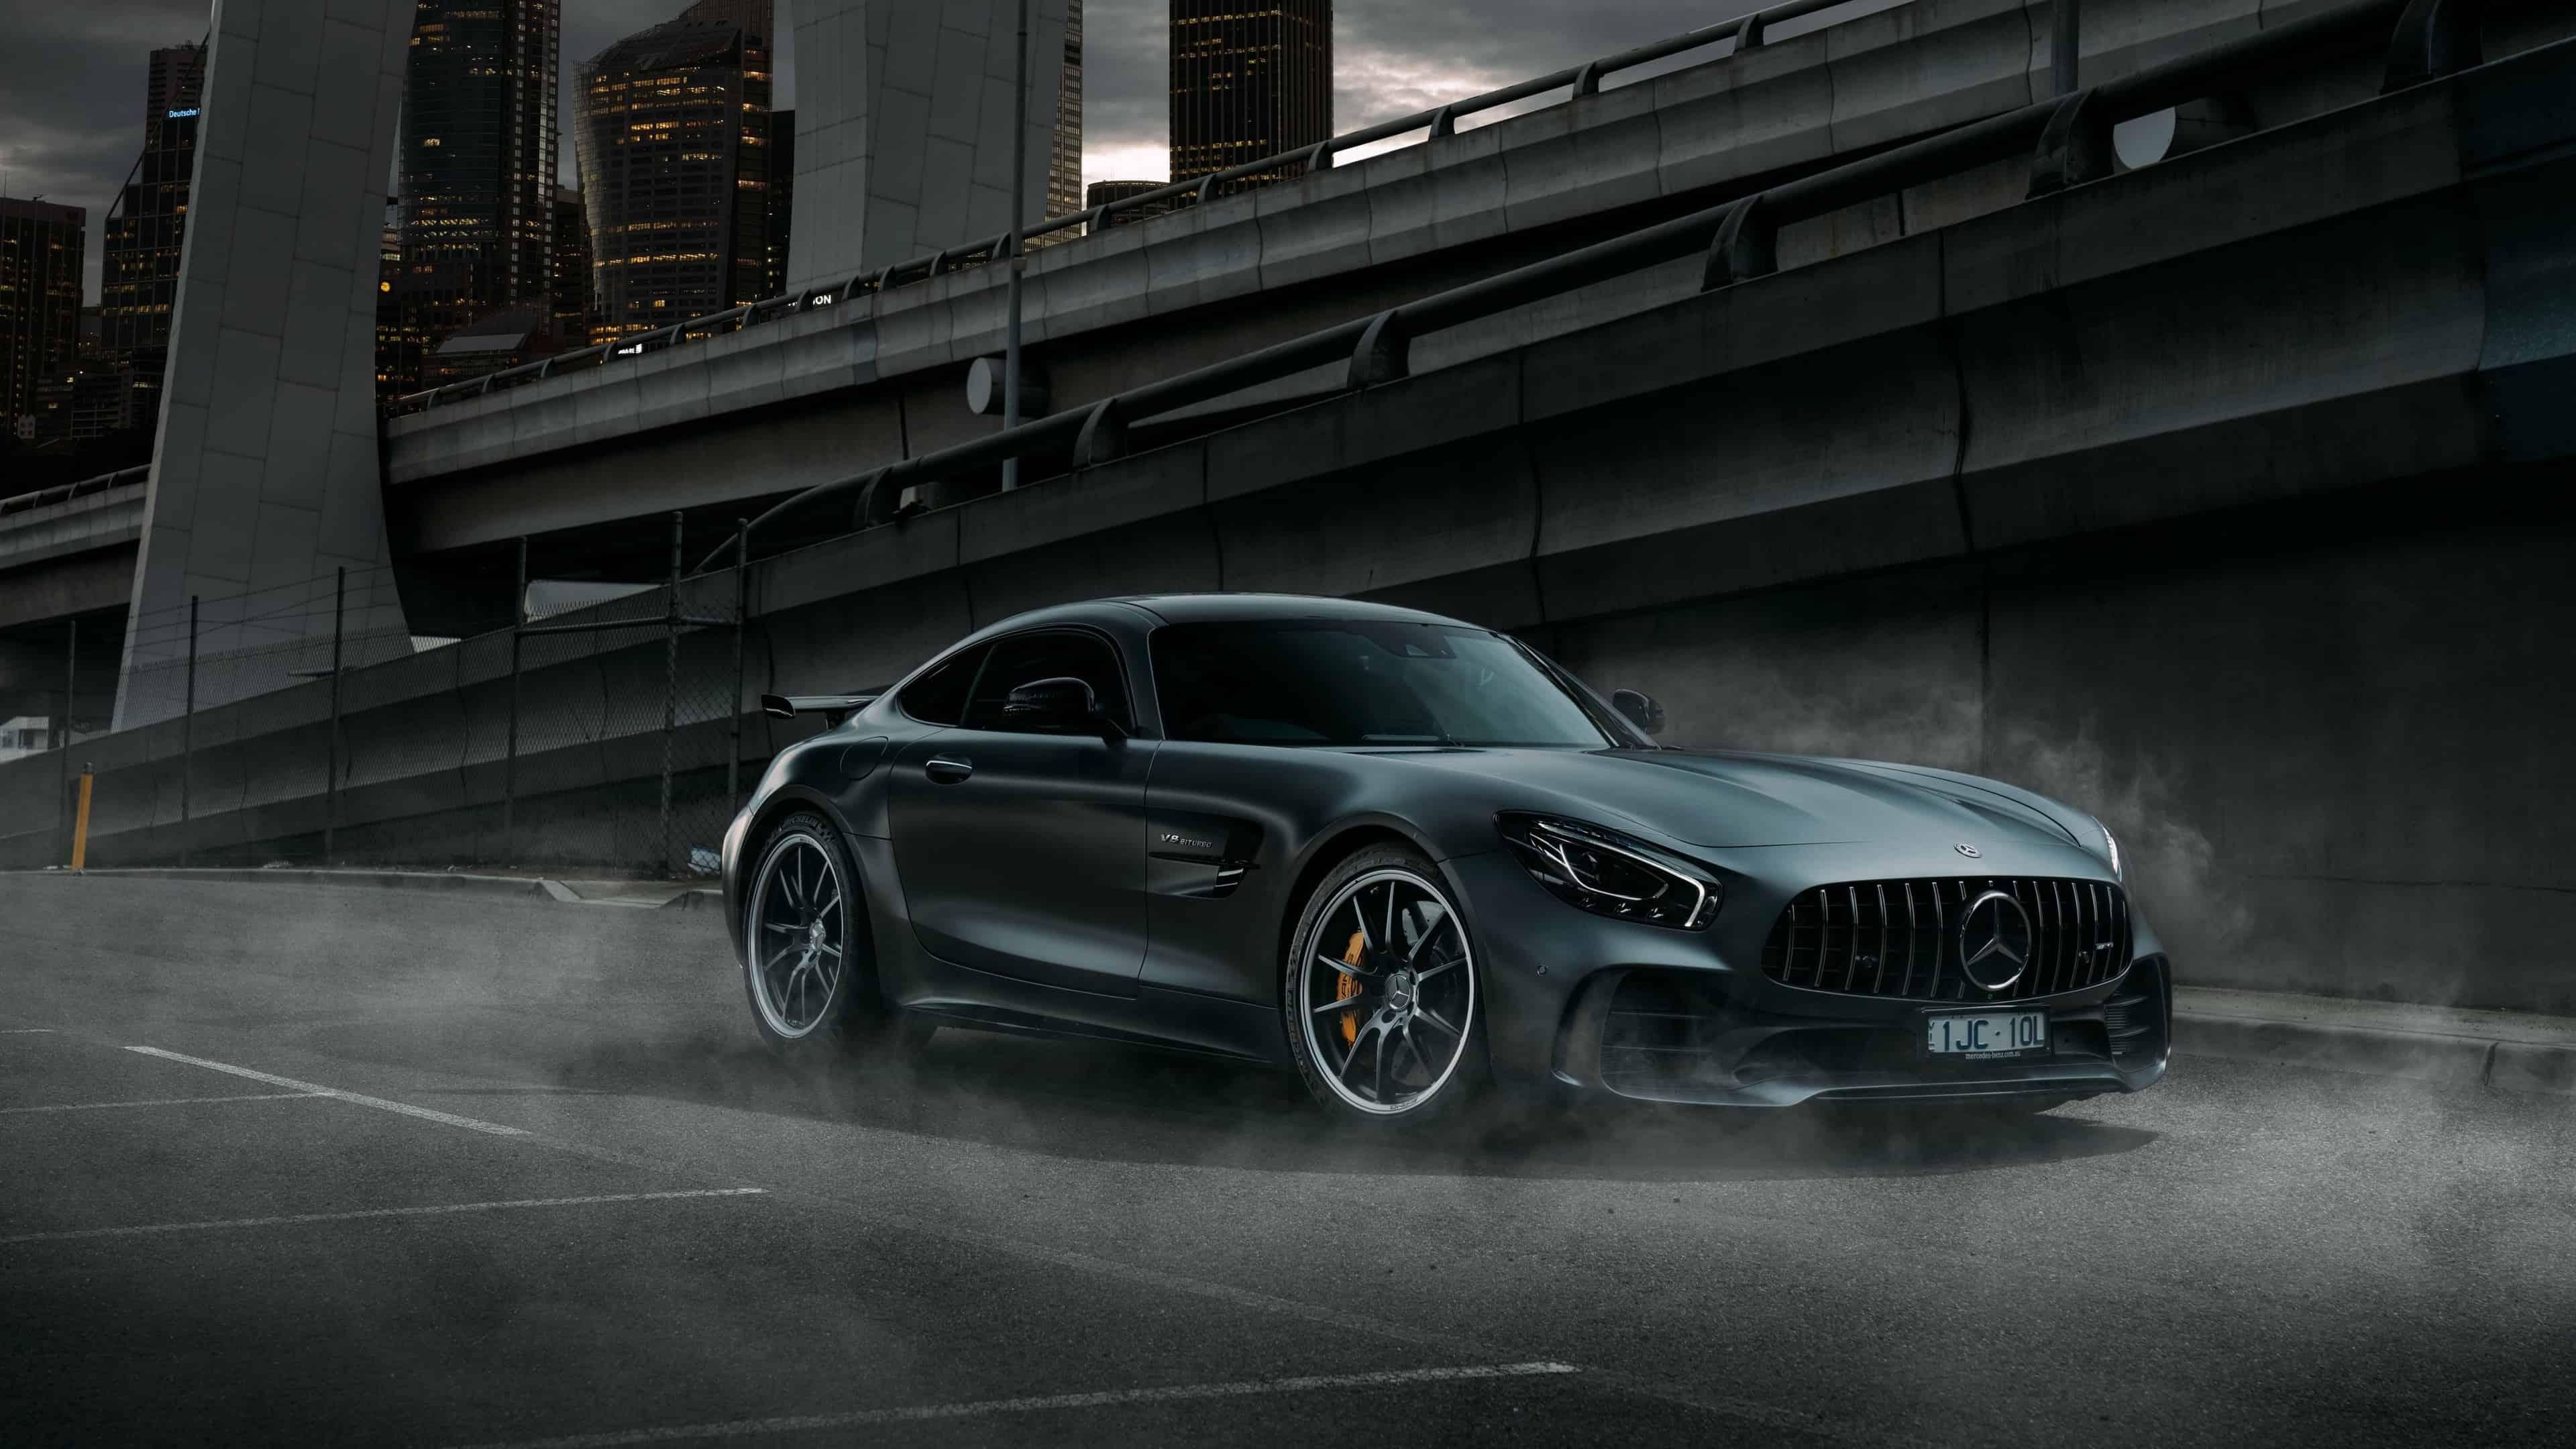 Benz 4k Wallpapers Top Free Benz 4k Backgrounds